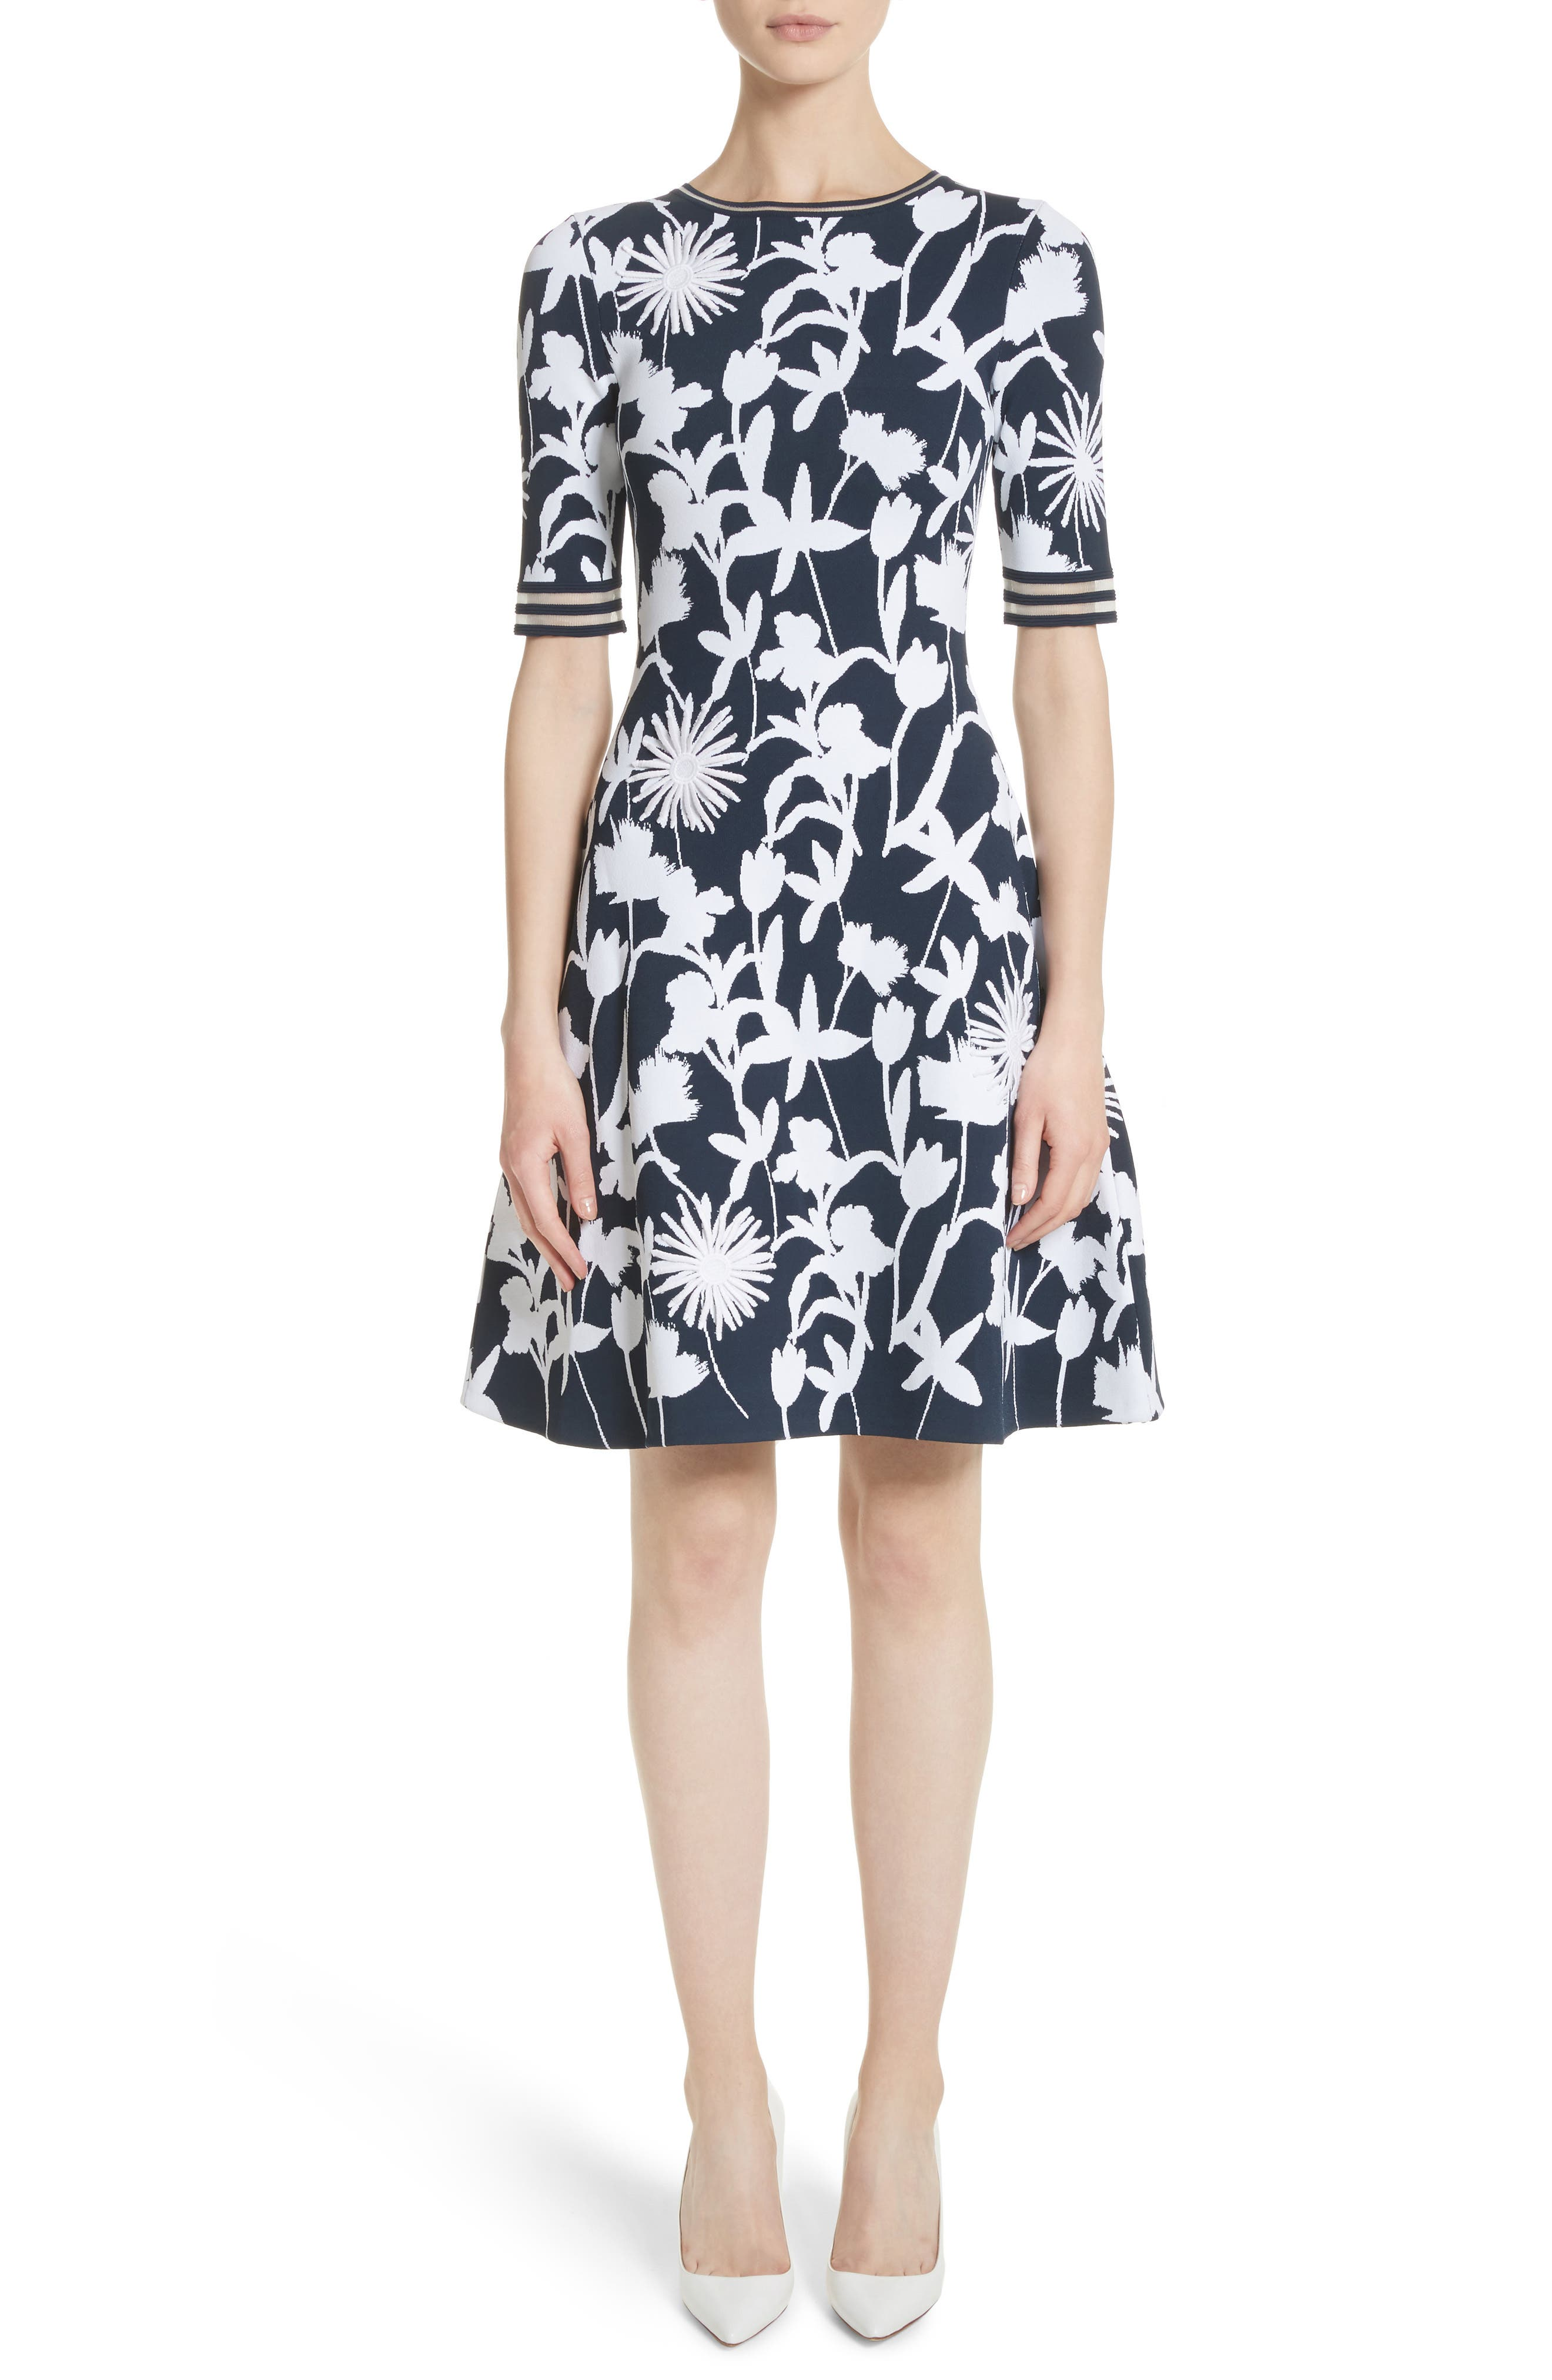 Main Image - Oscar de la Renta Floral Appliqué Intarsia Knit Dress